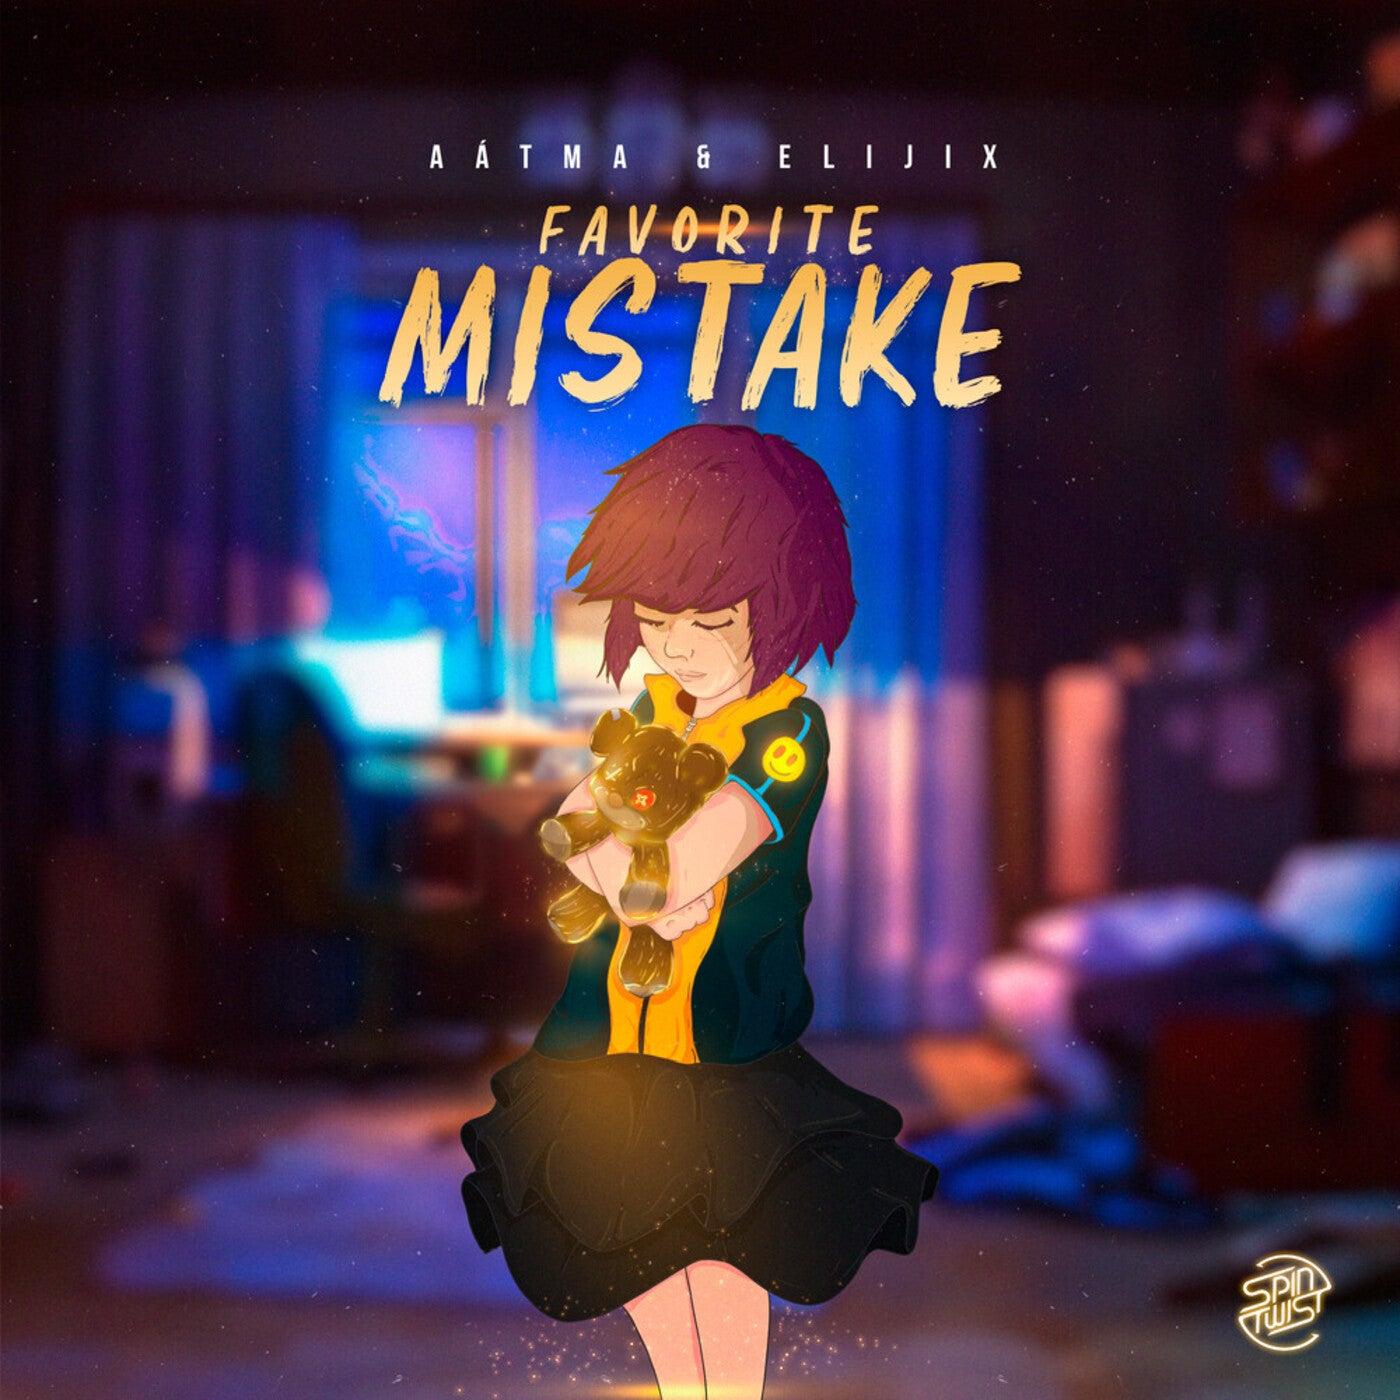 Favorite Mistake (Original Mix)